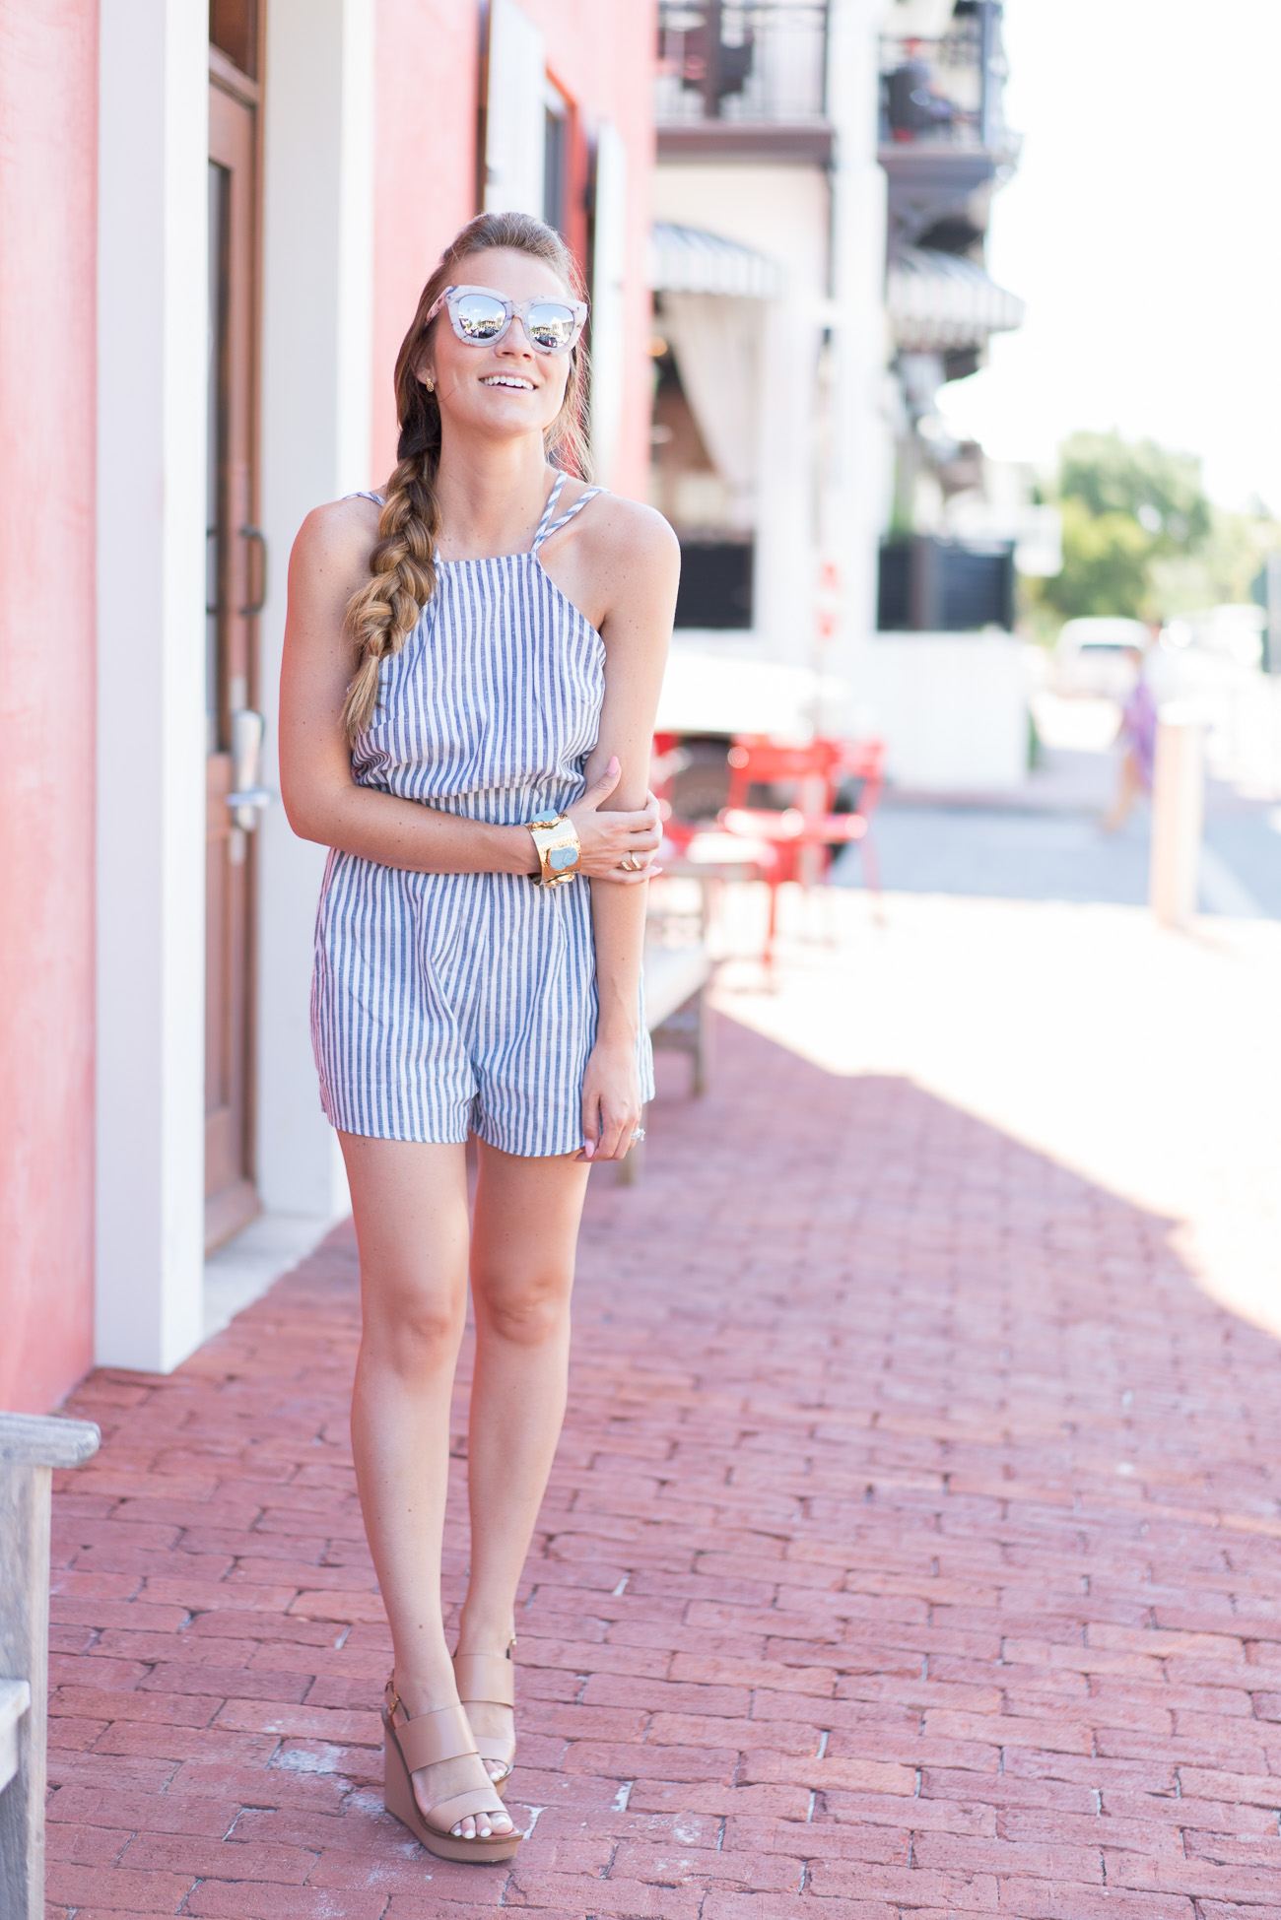 SheIn $15 striped romper Rosemary Beach, FL angela lanter hello gorgeous